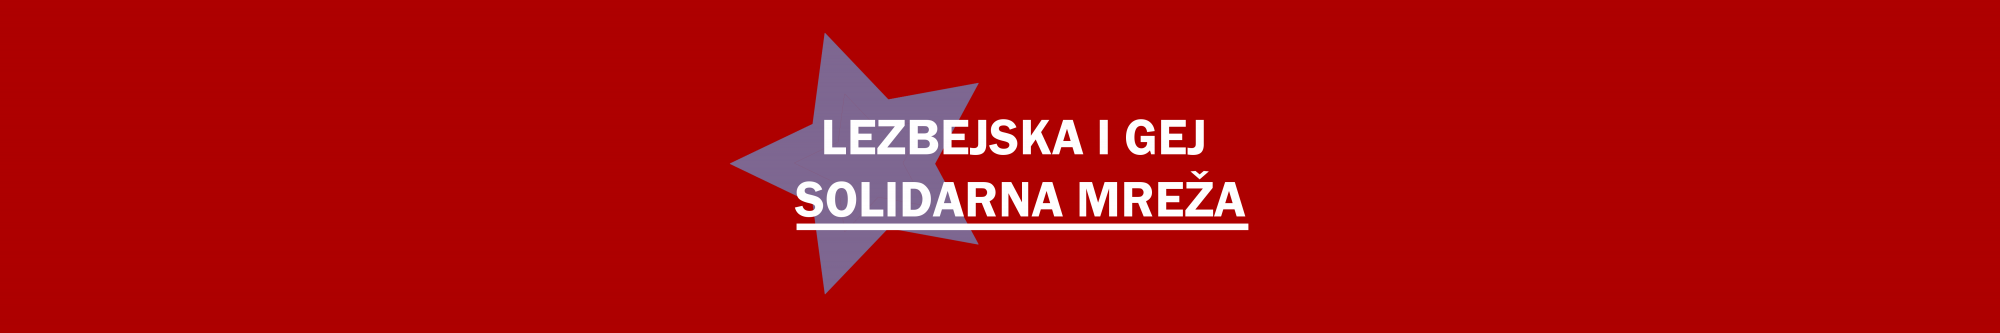 Lezbejska i gej solidarna mreža